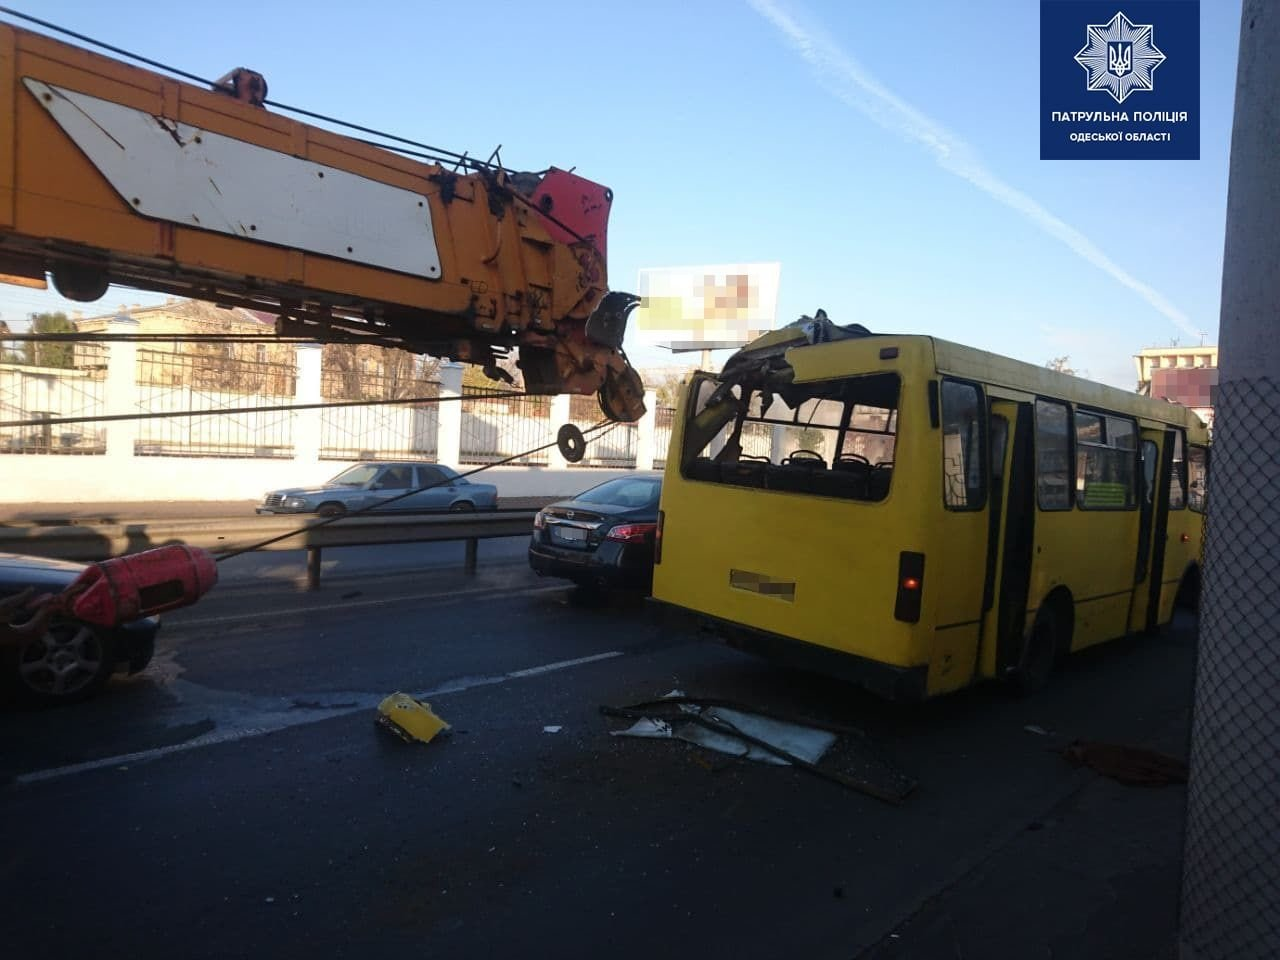 В Одессе кран протаранил маршрутку, 2 человека госпитализированы, - ФОТО, ВИДЕО, фото-1